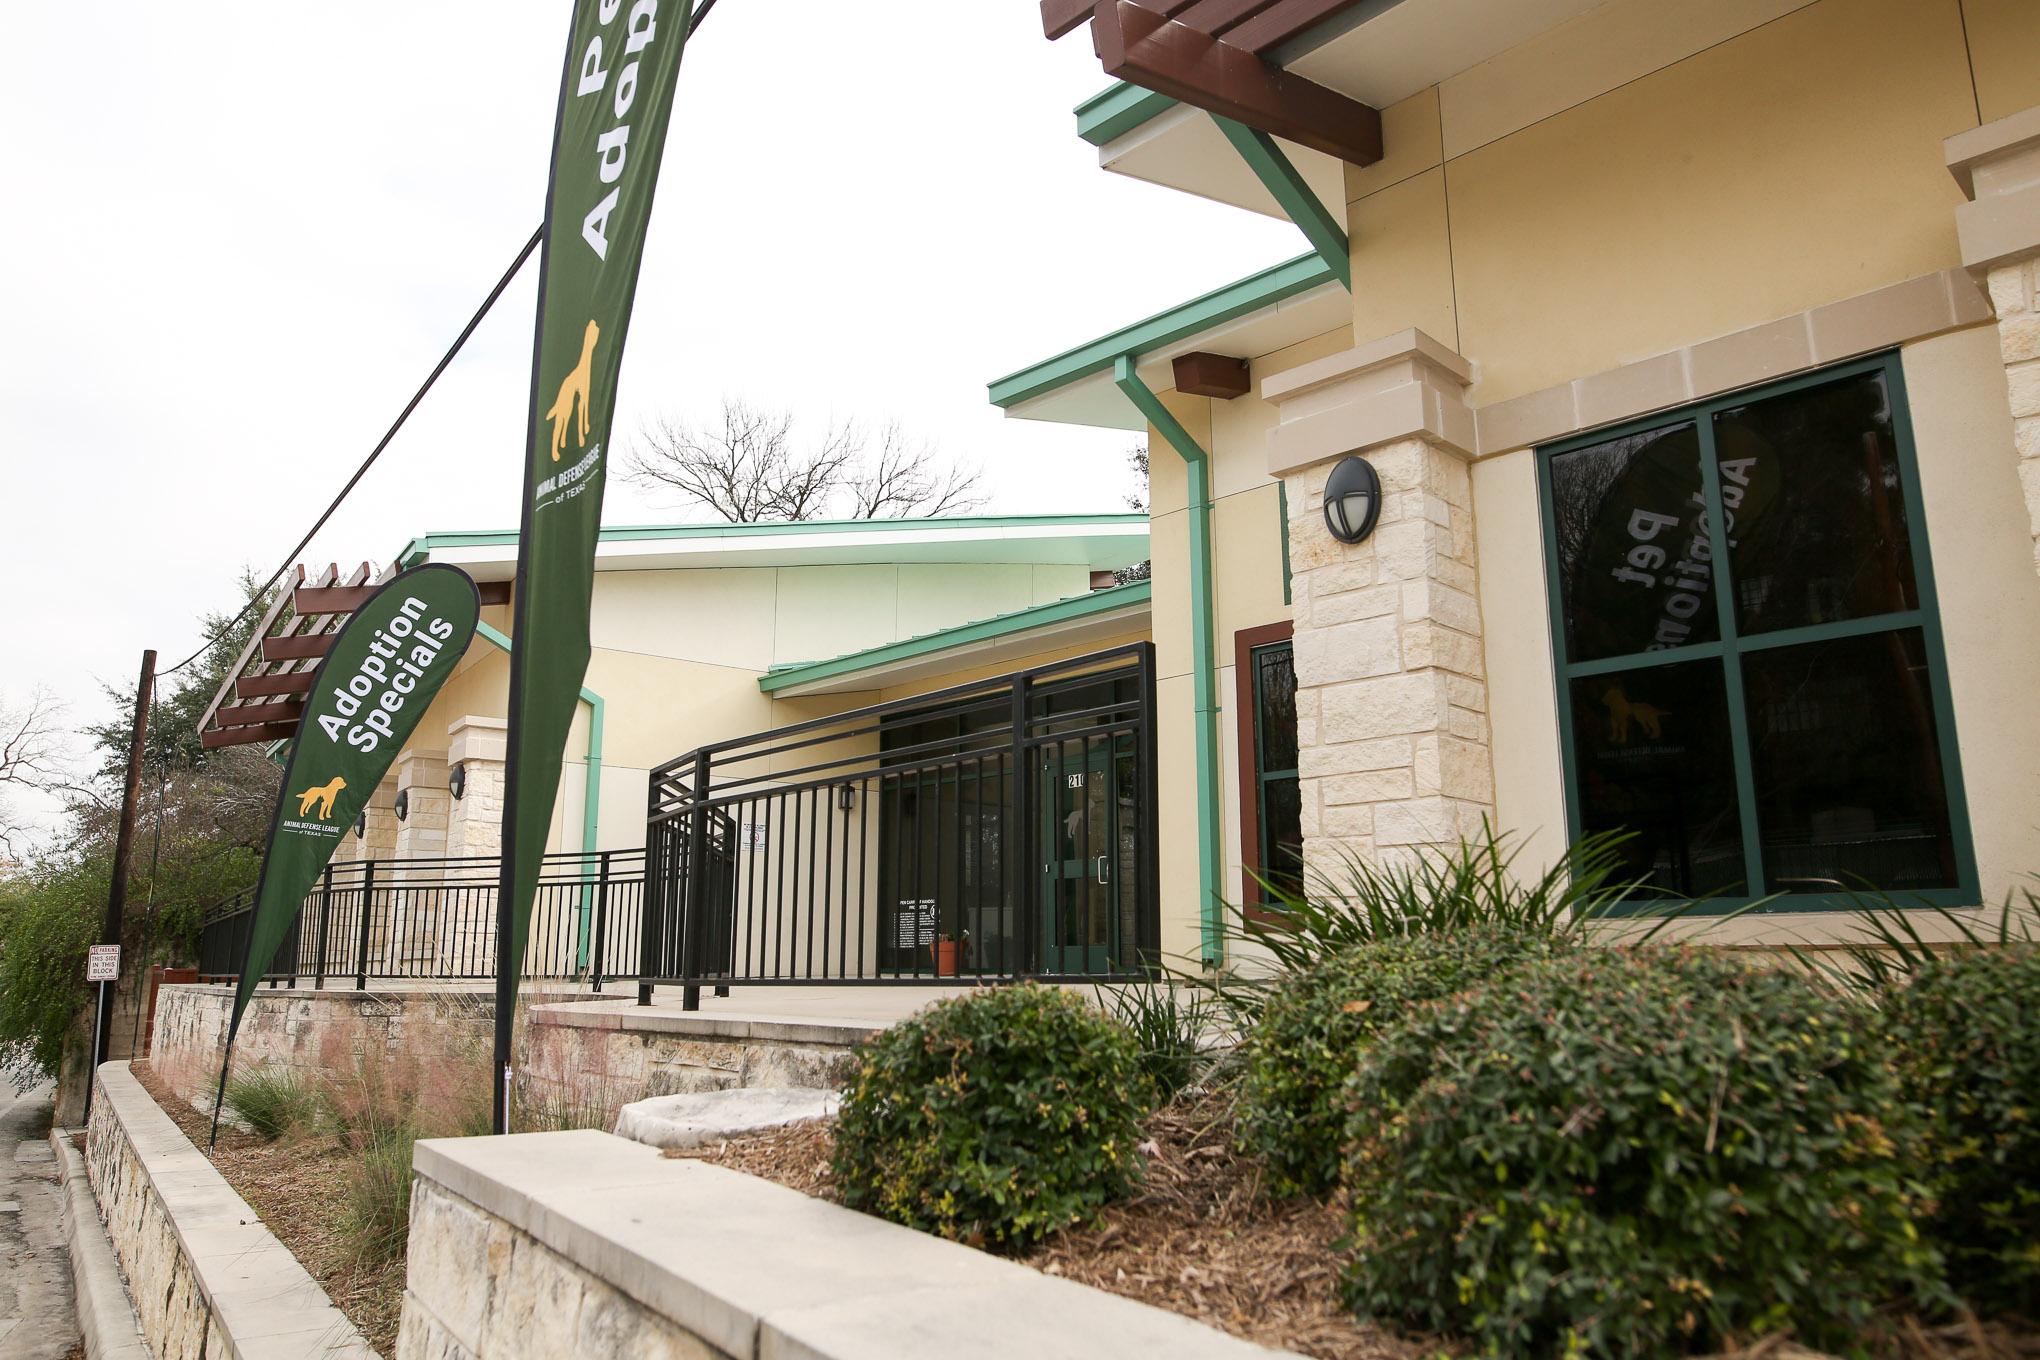 The Animal Defense League now occupies the Paul Jolly Adoption Center at 210 Tuleta Drive across the street from the San Antonio Zoo in Brackenridge park.